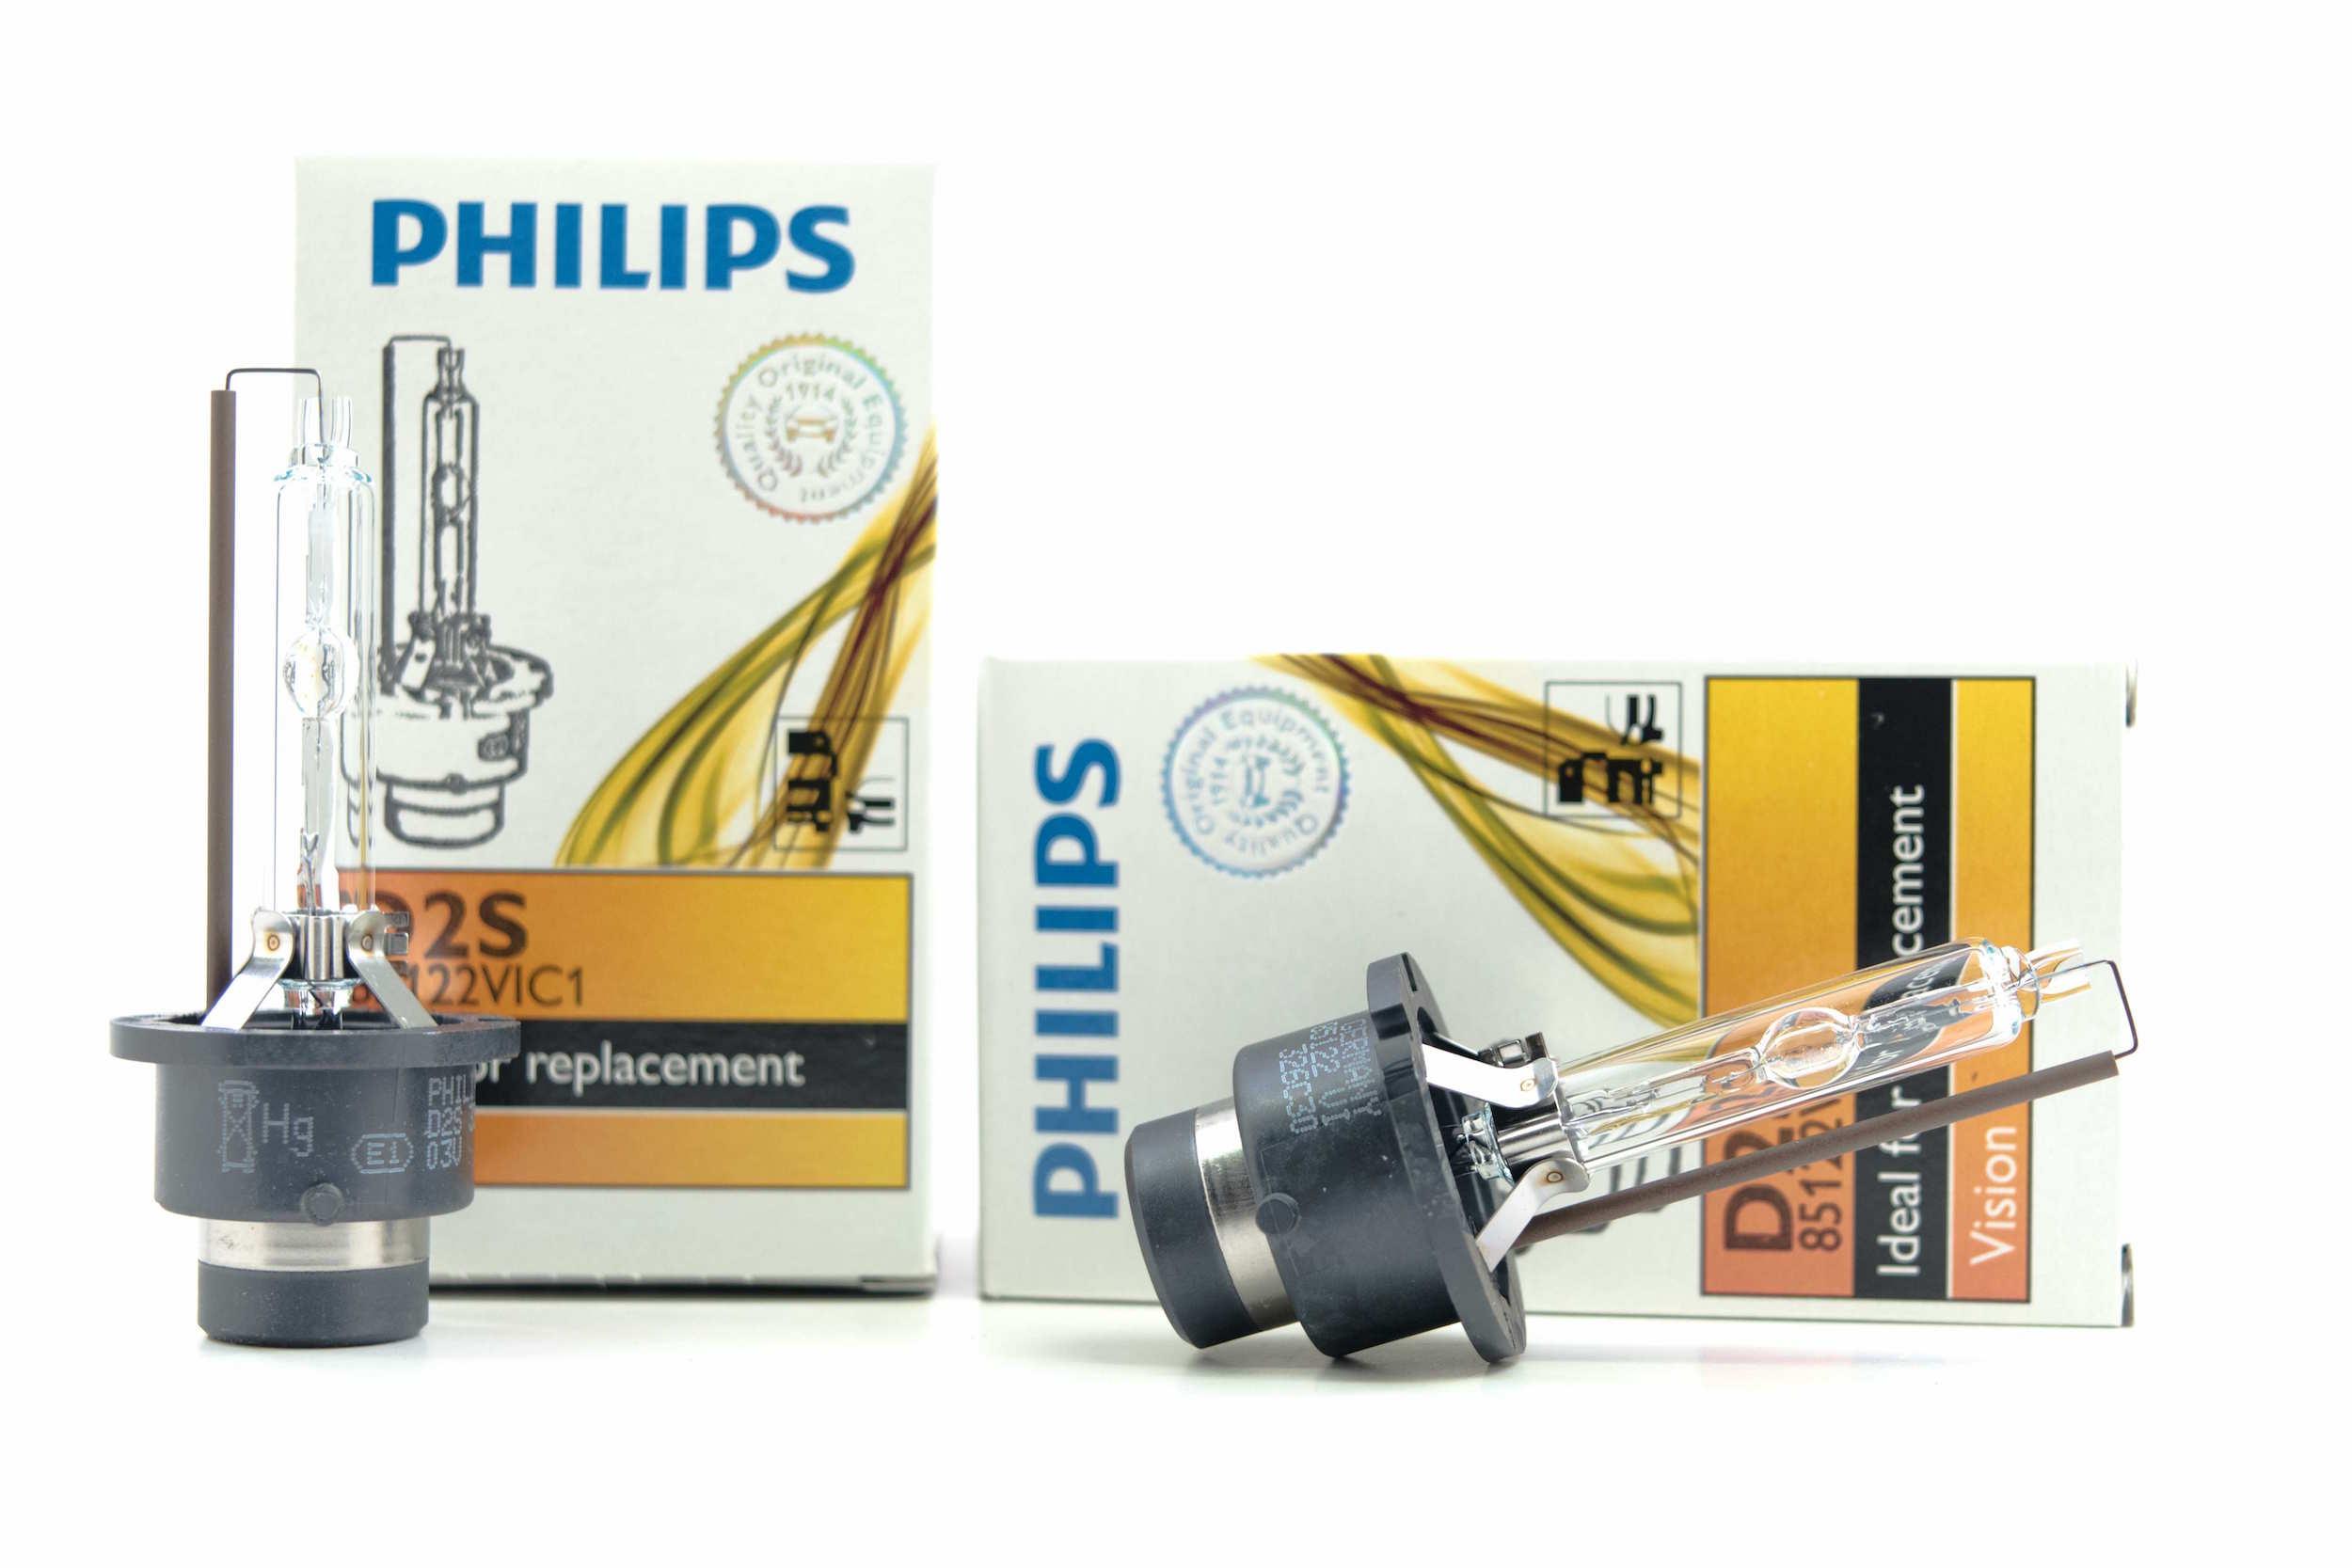 HCX Rebased PHILIPS OEM 4300K 85122 D2S HID Xenon to 9006 HB4 bulbs 35W Germany